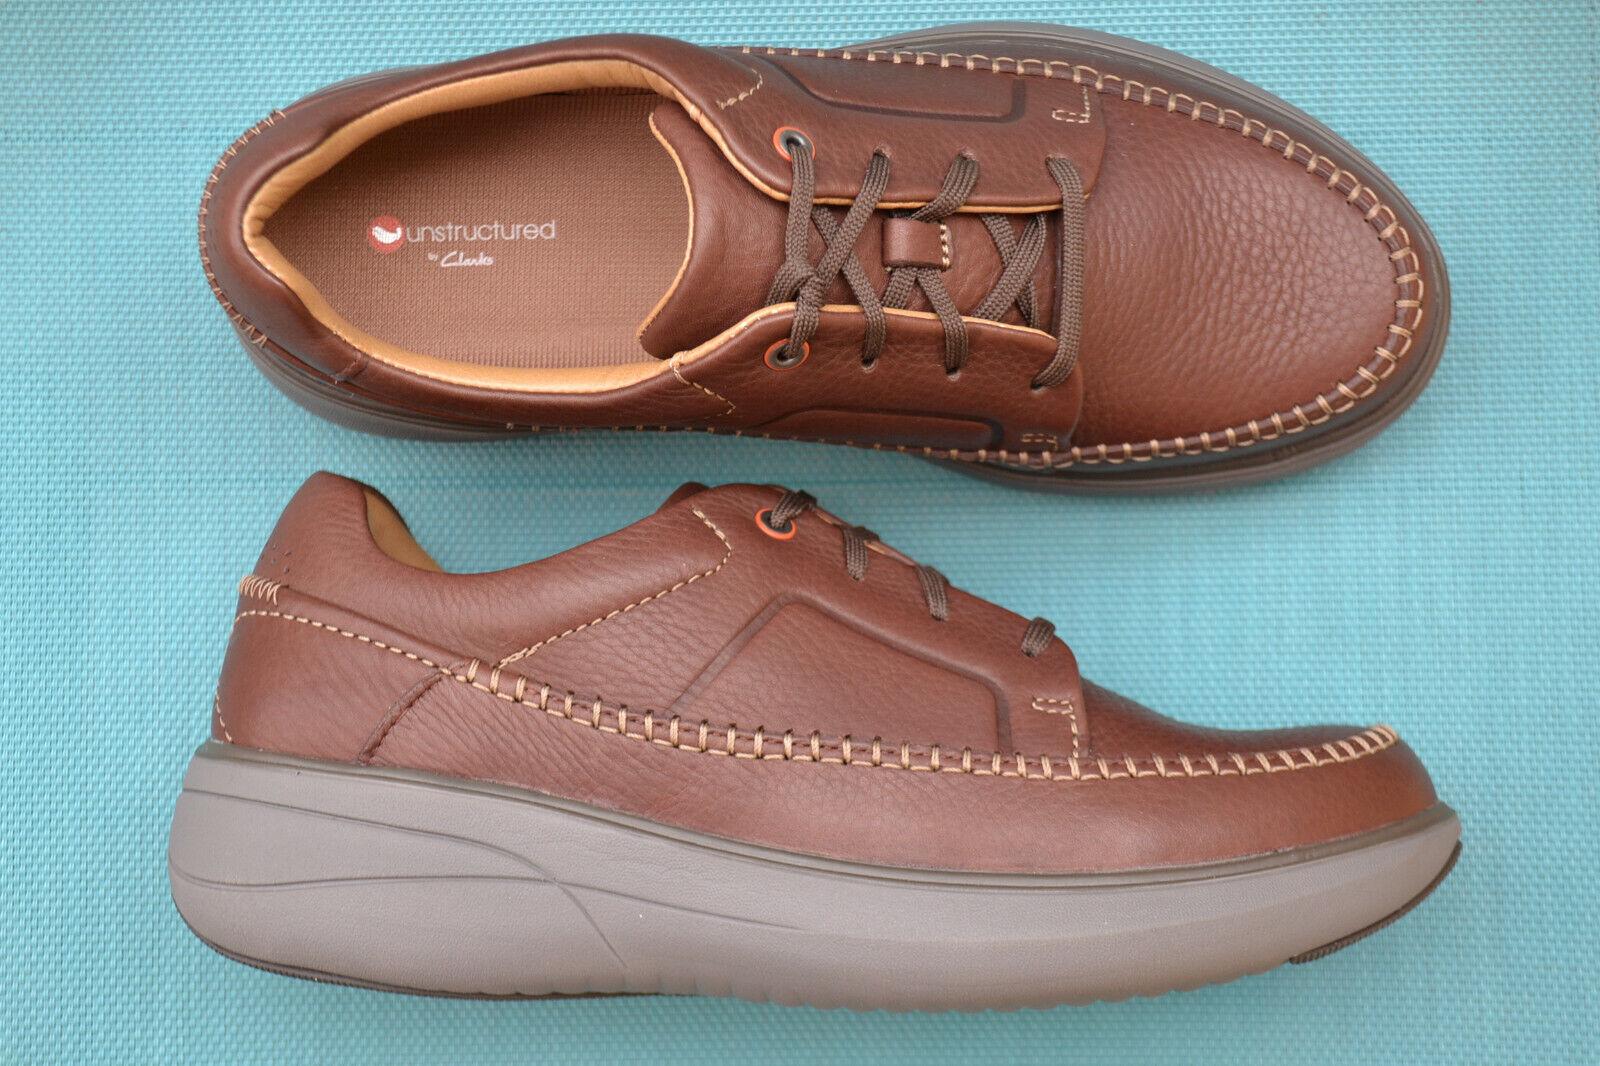 Clarks BNIB Mens Casual Shoes UN RISE LACE Mahogany Leather UK 7 / 41